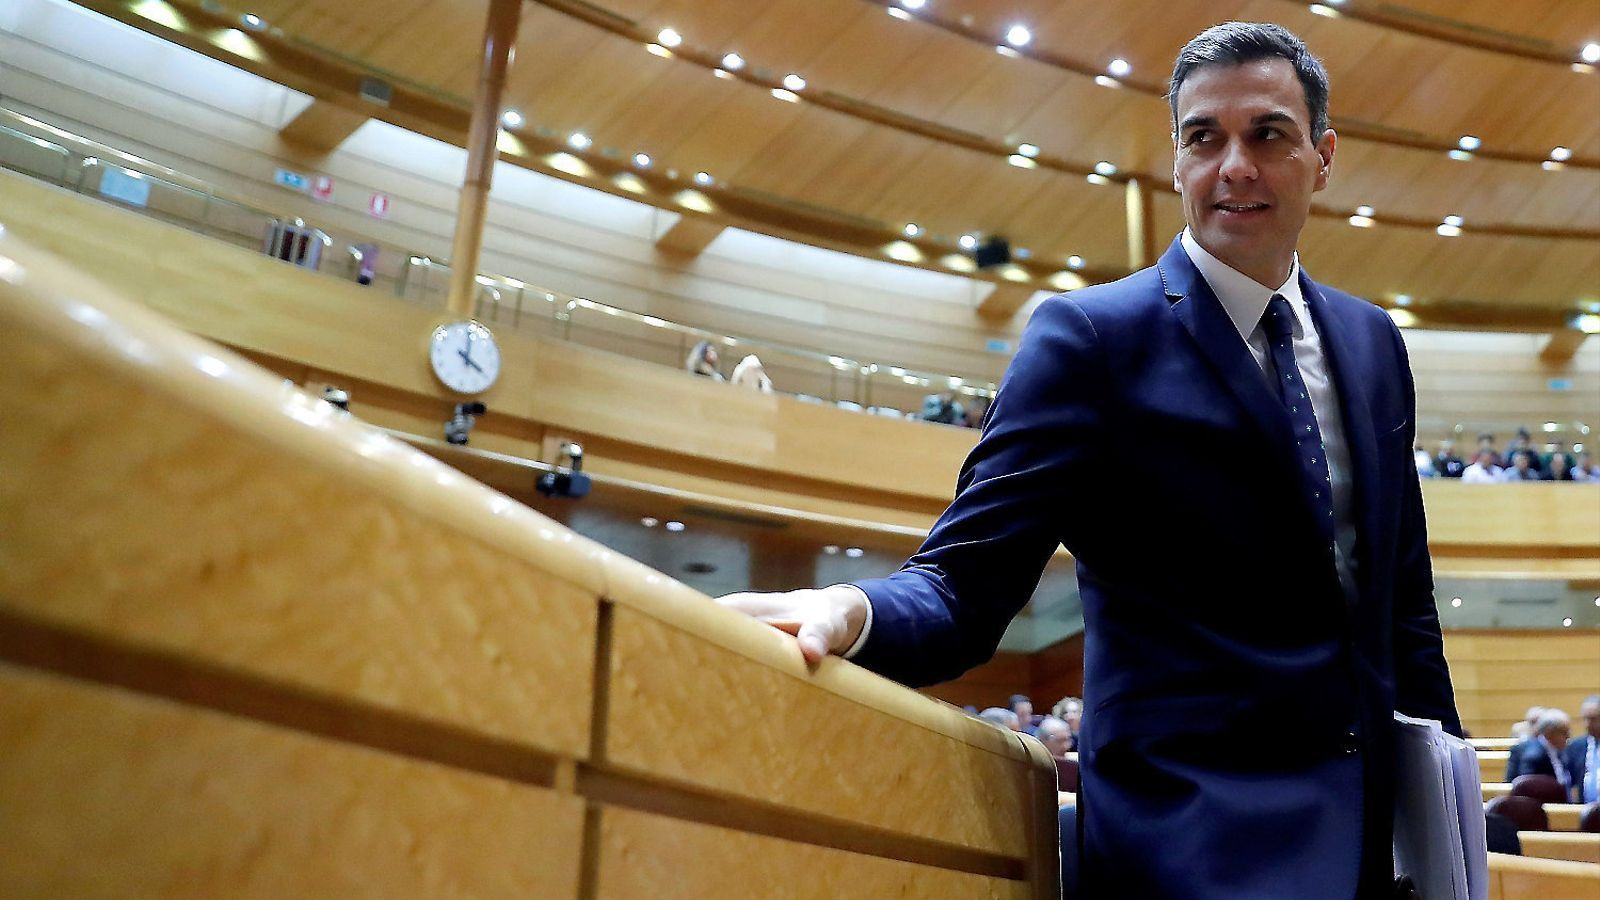 El president espanyol, Pedro Sánchez, al mes de desembre al Senat. / JUAN CARLOS HIDALGO / EFE